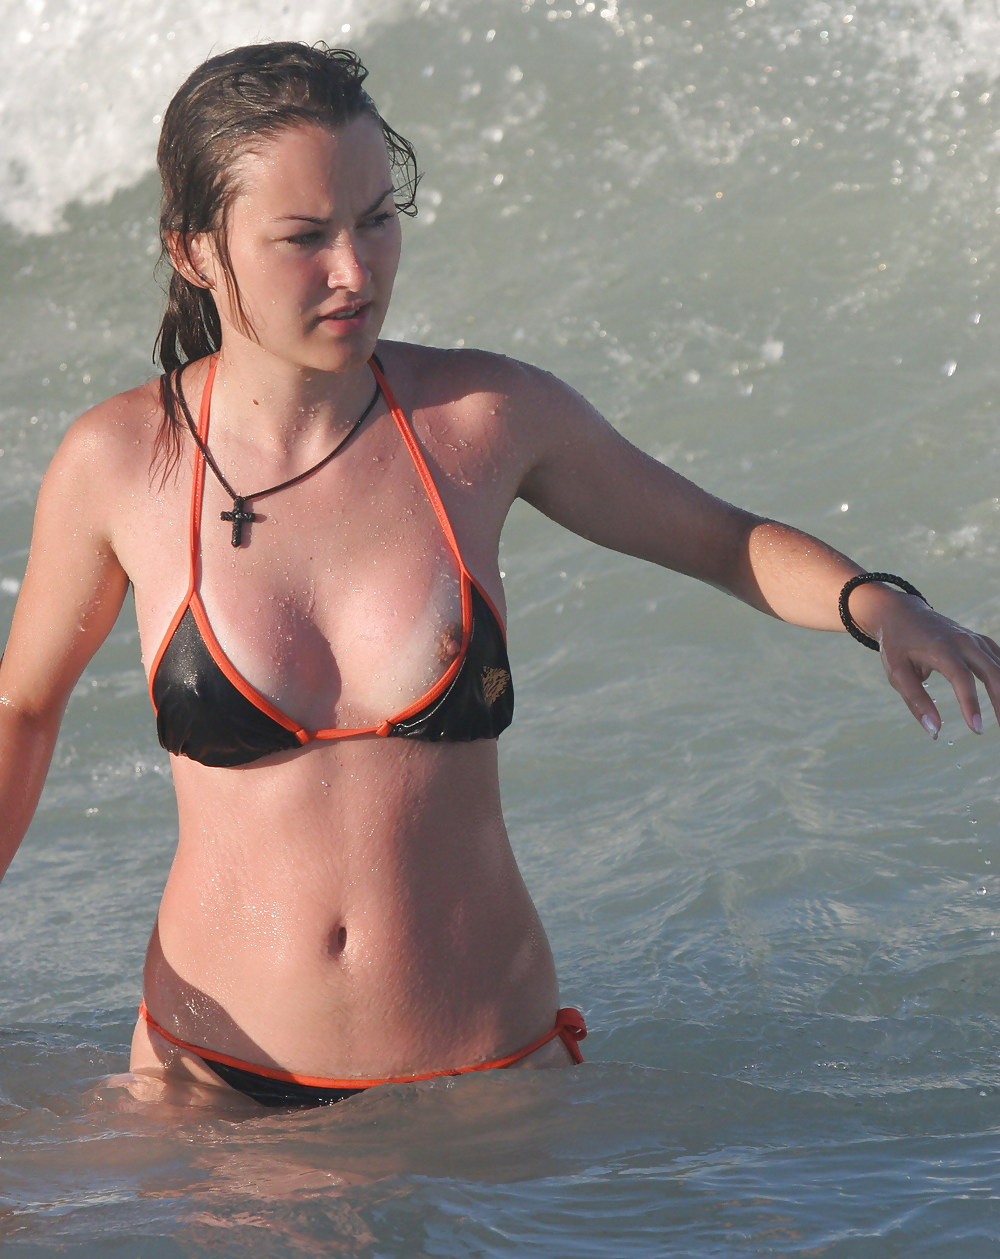 pics slip Bikini nip